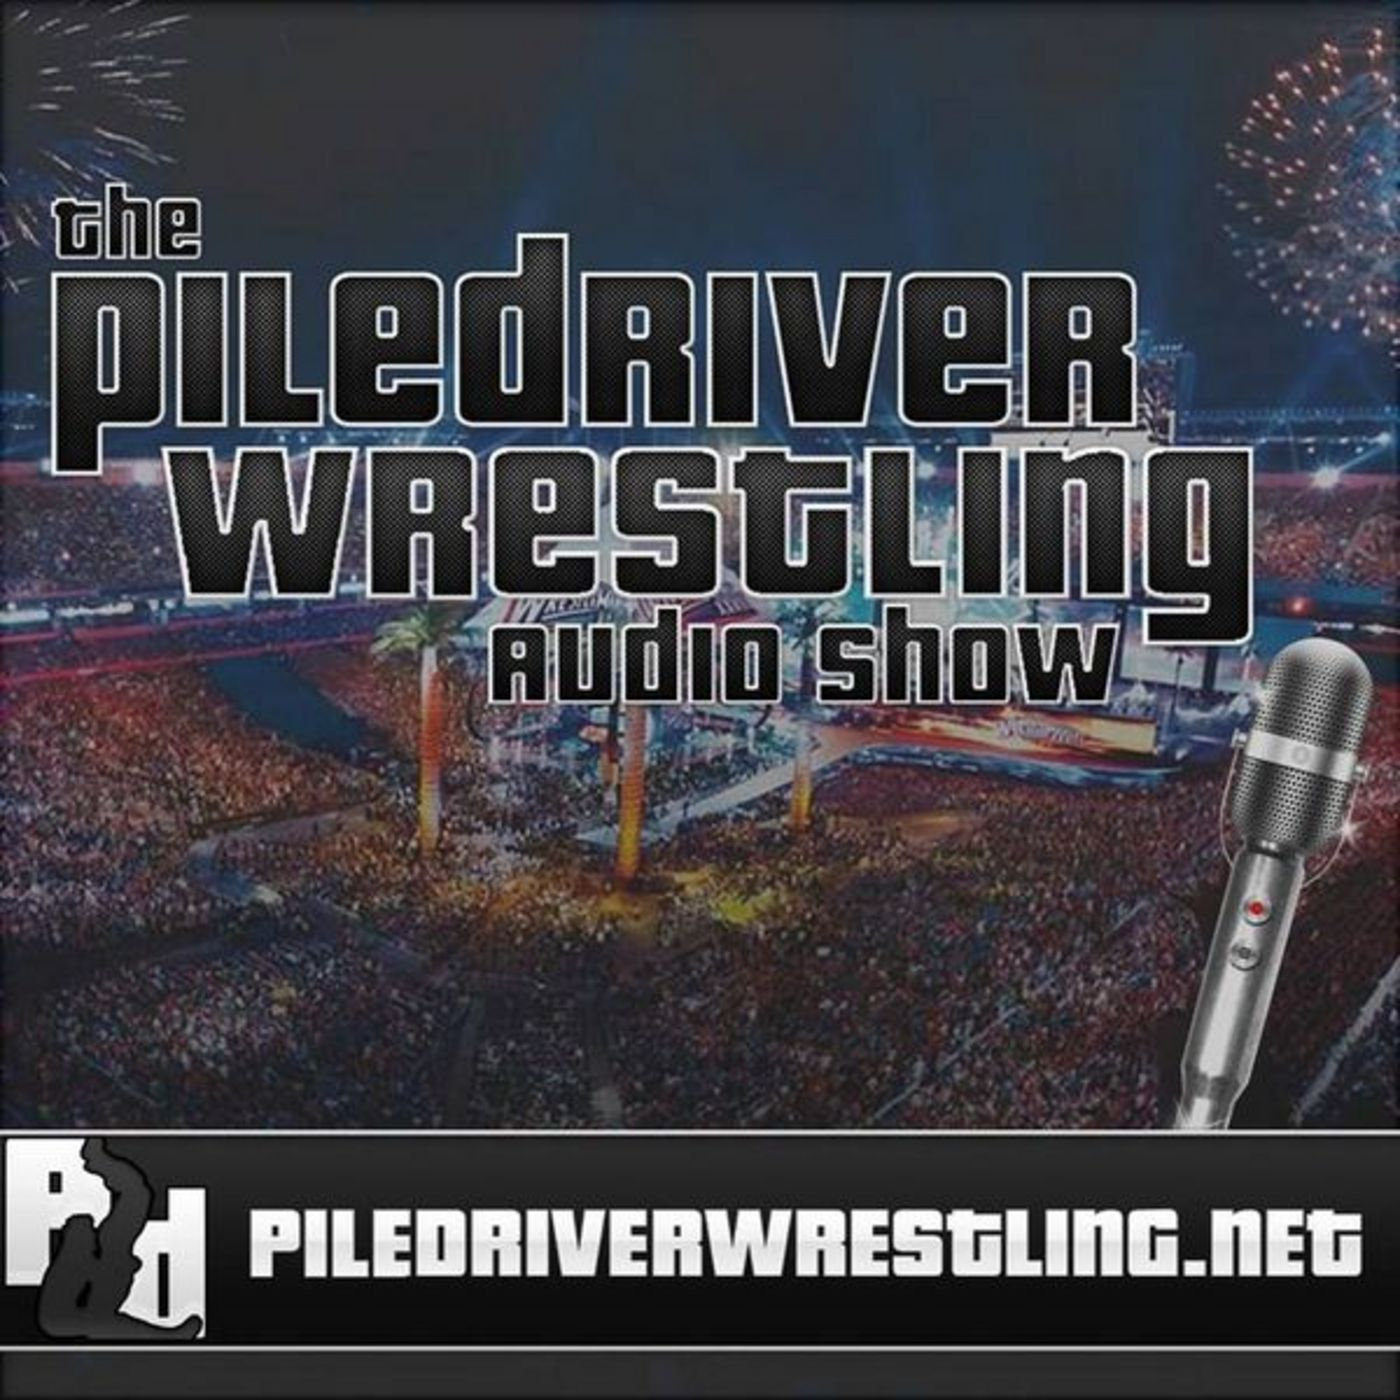 <![CDATA[Piledriver Wrestling Audio Show]]>